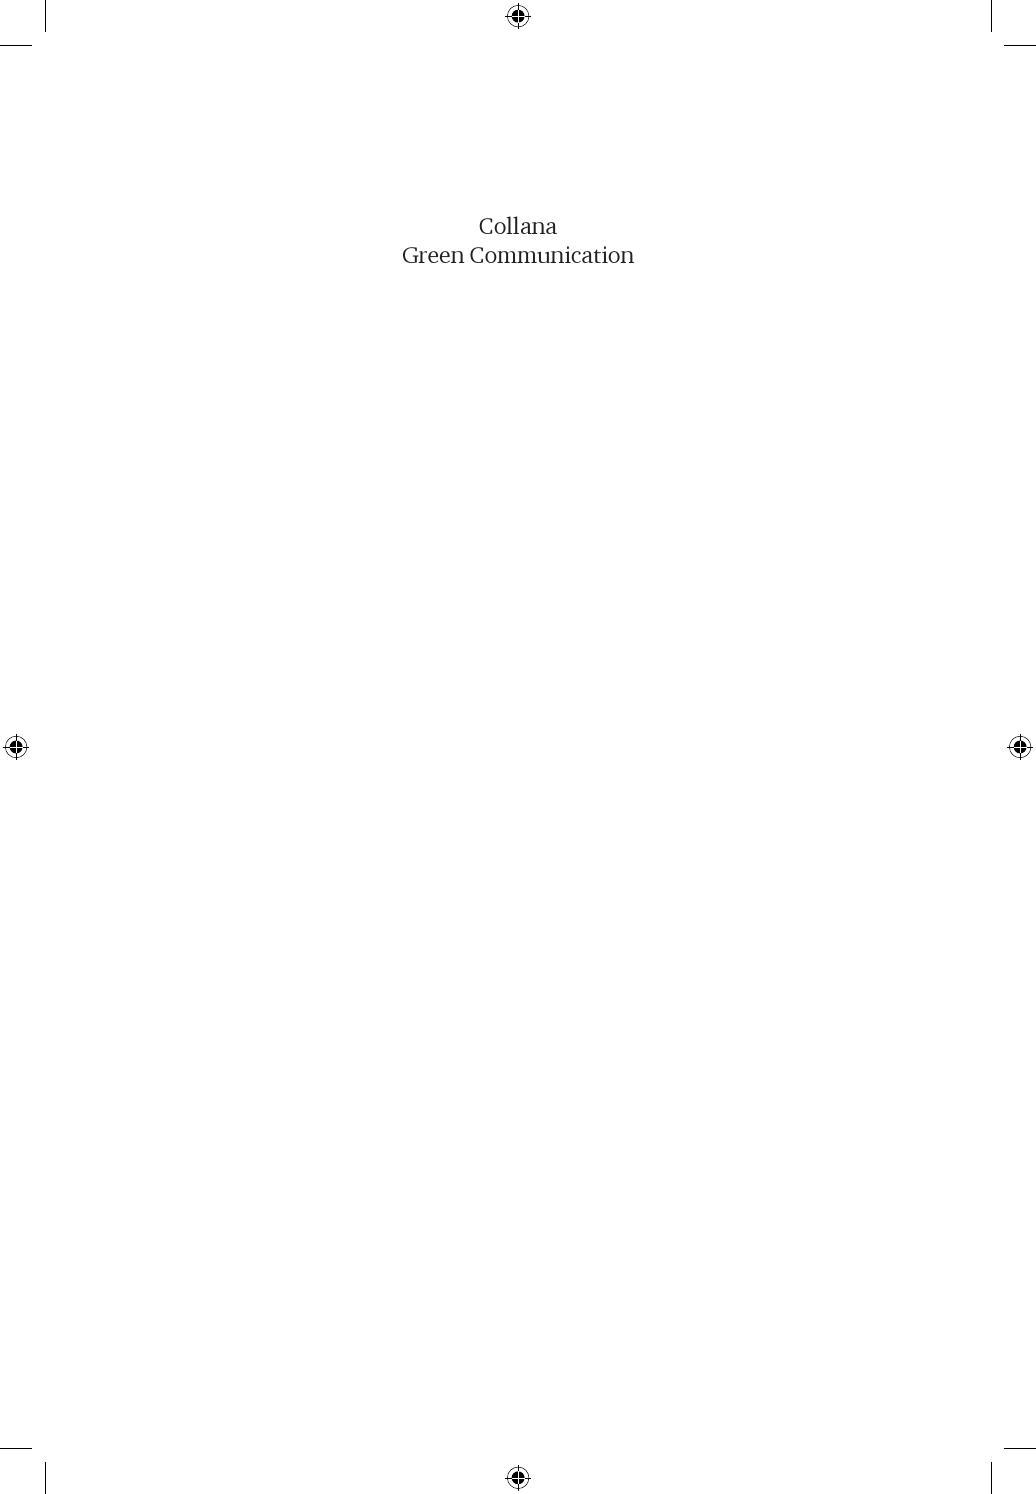 dating siti Web Kamloops